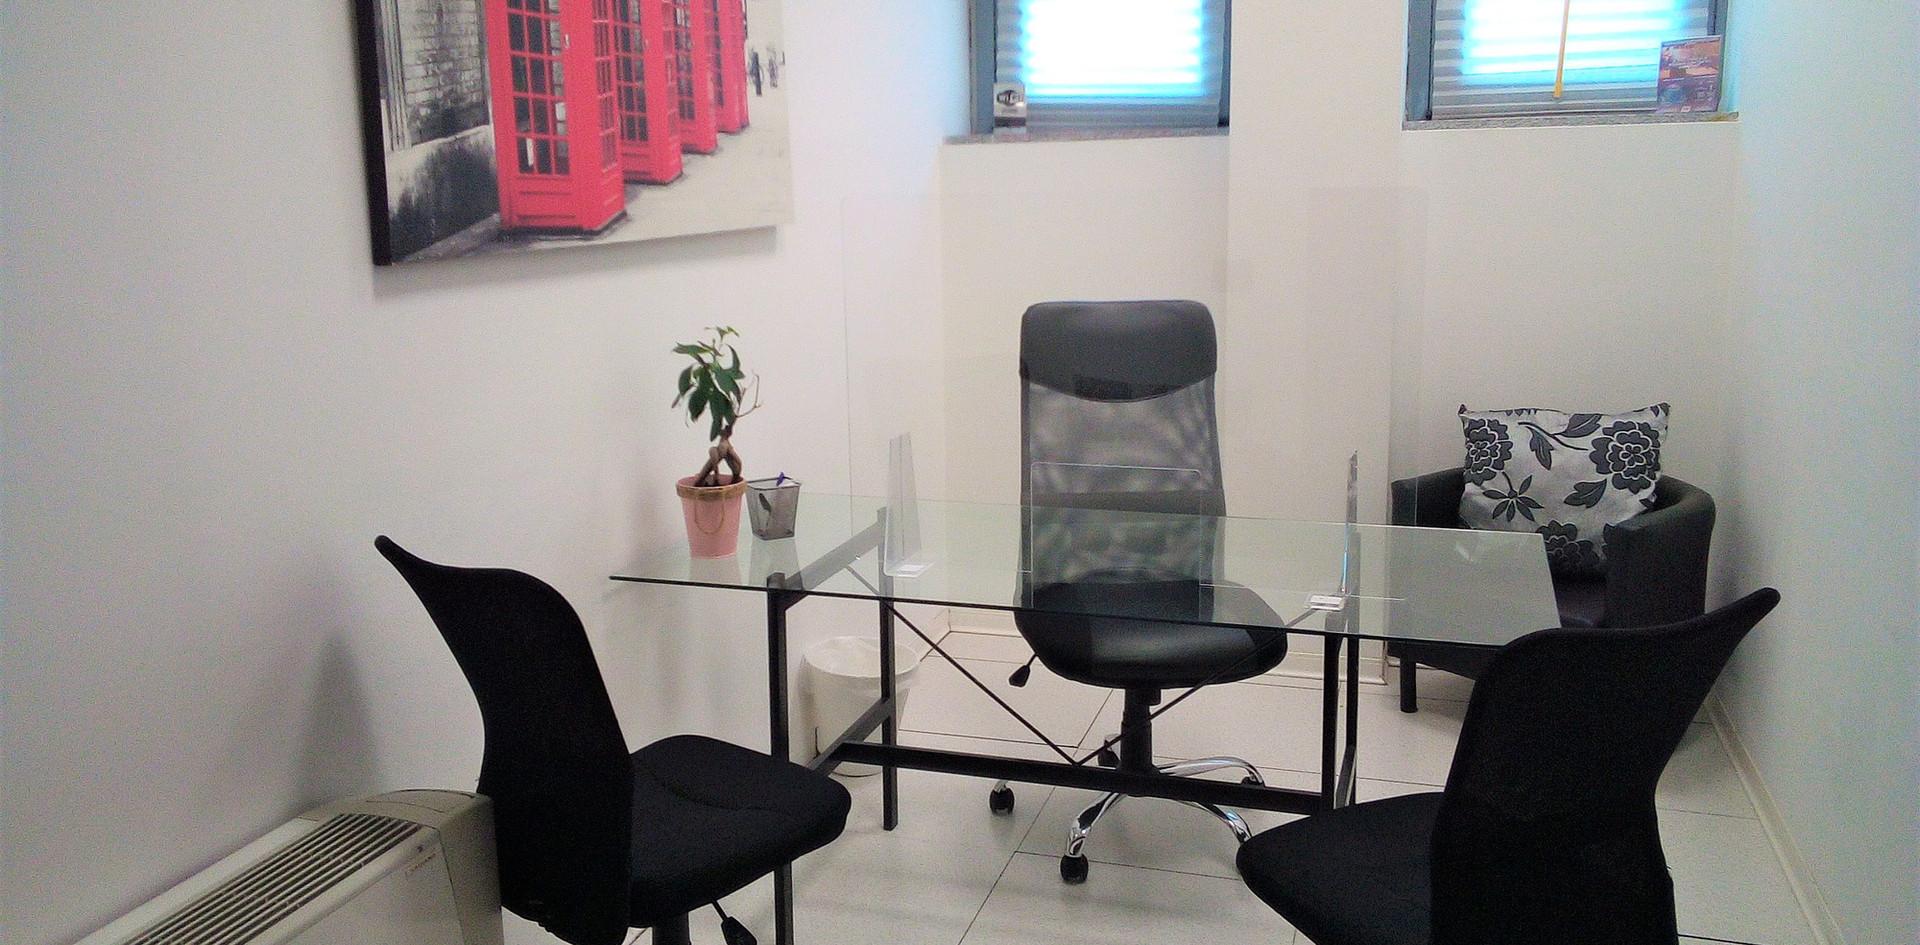 ufficio emporaneo Coworking New Work Bollate.jpg